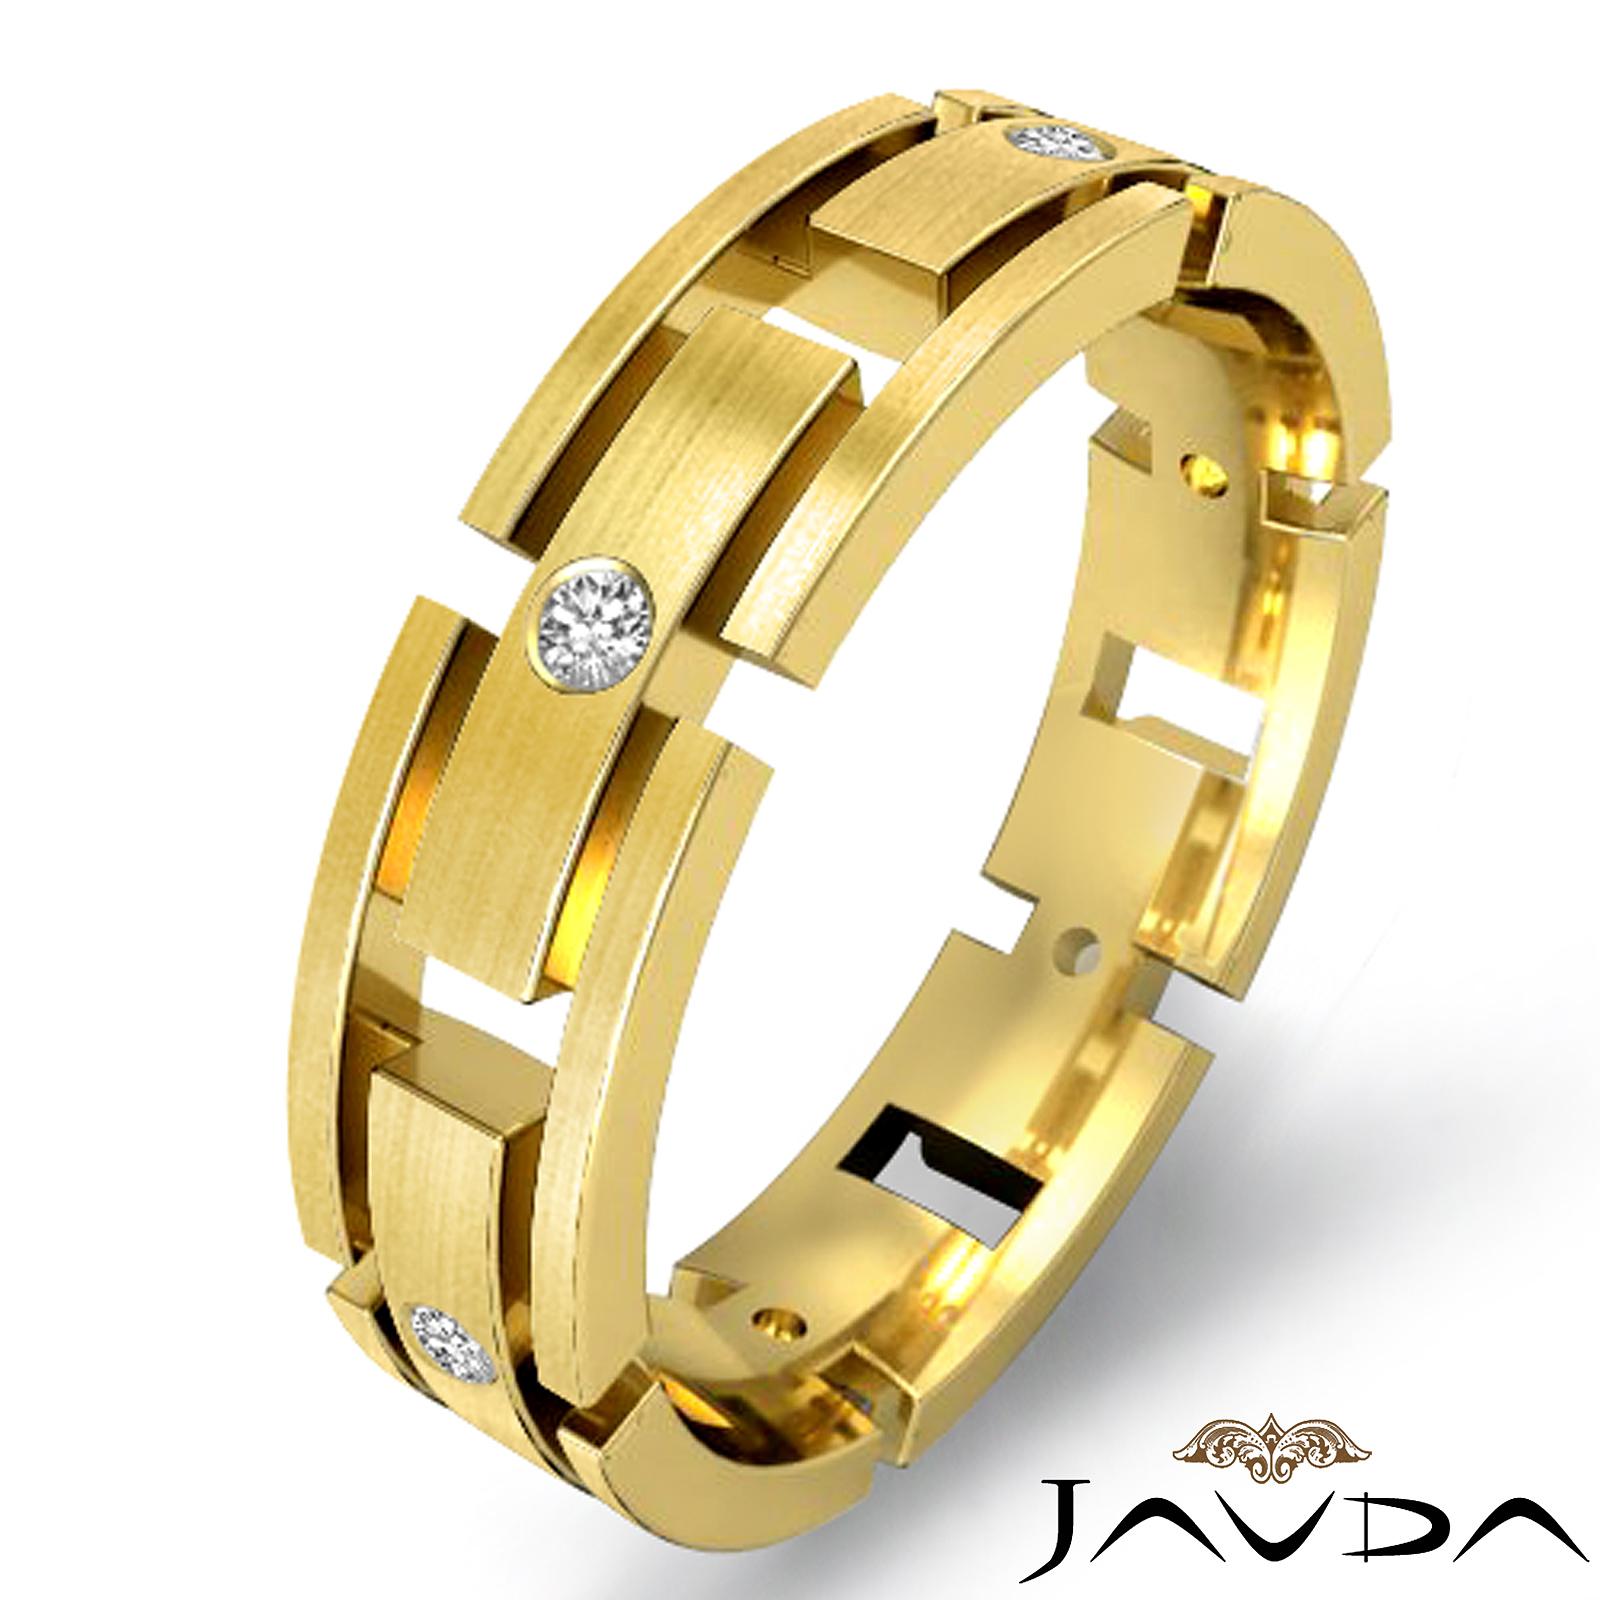 round diamond eternity wedding ring men 39 s block link band 18k yellow gold ebay. Black Bedroom Furniture Sets. Home Design Ideas